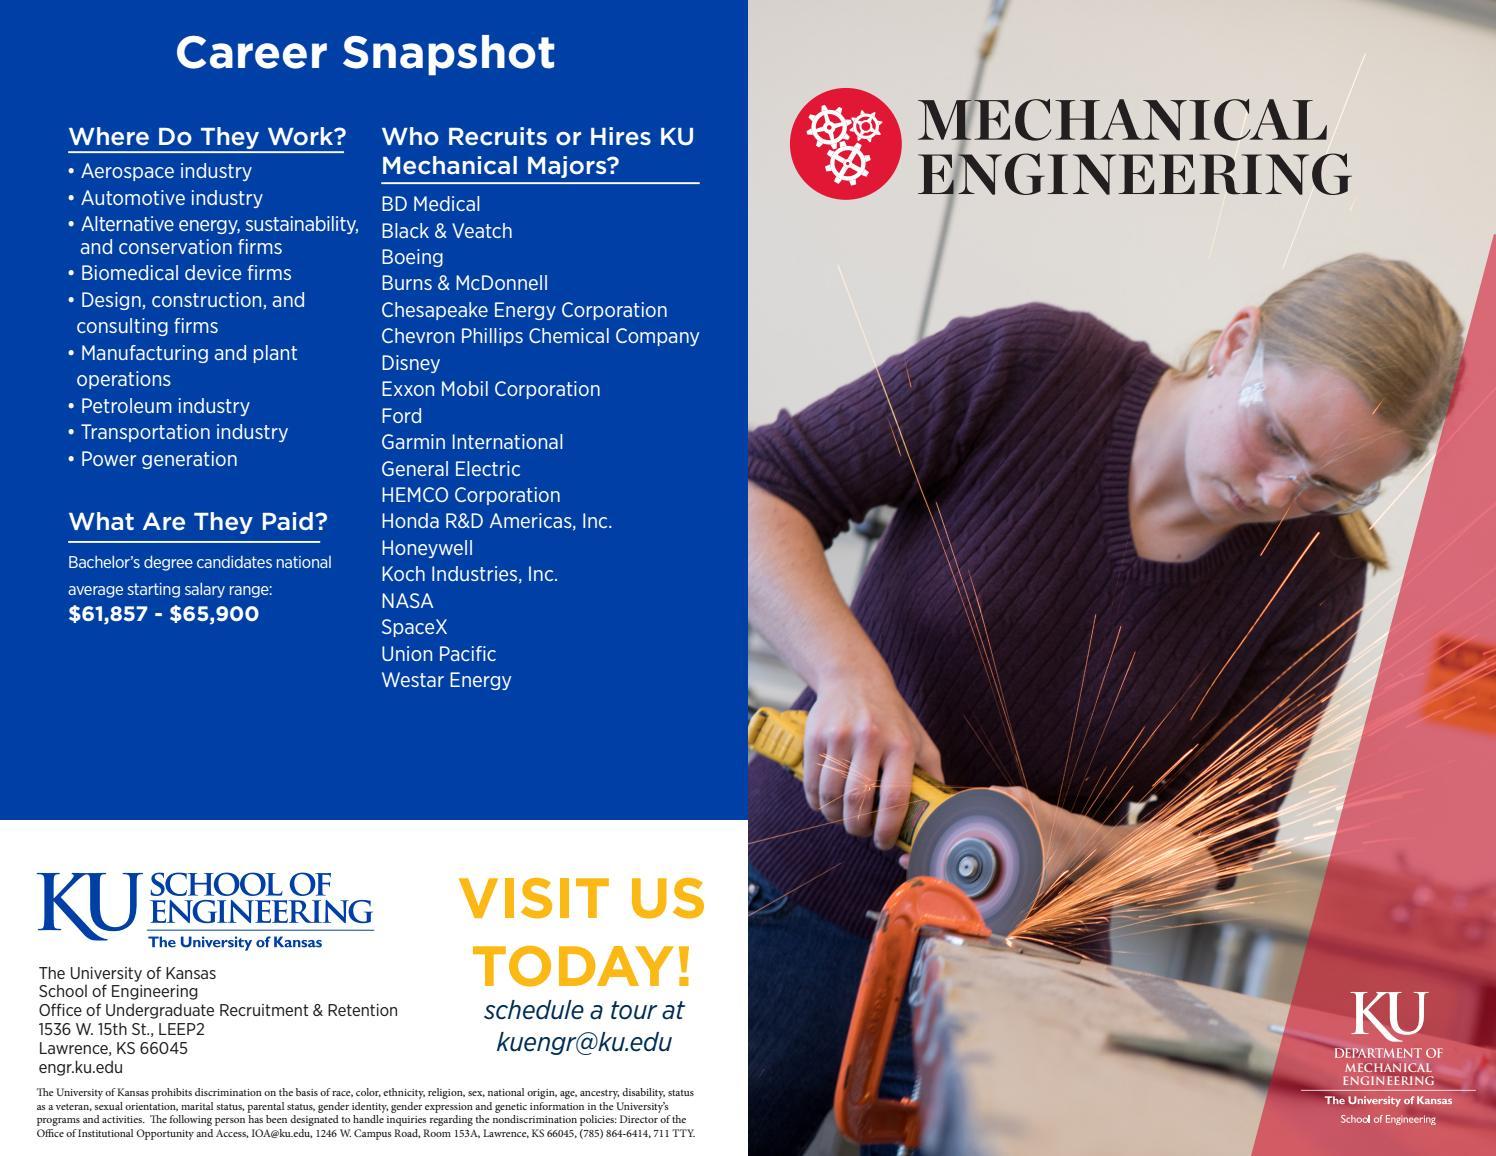 Ku engineering mechanical engineering guide(2017 2018) by KU